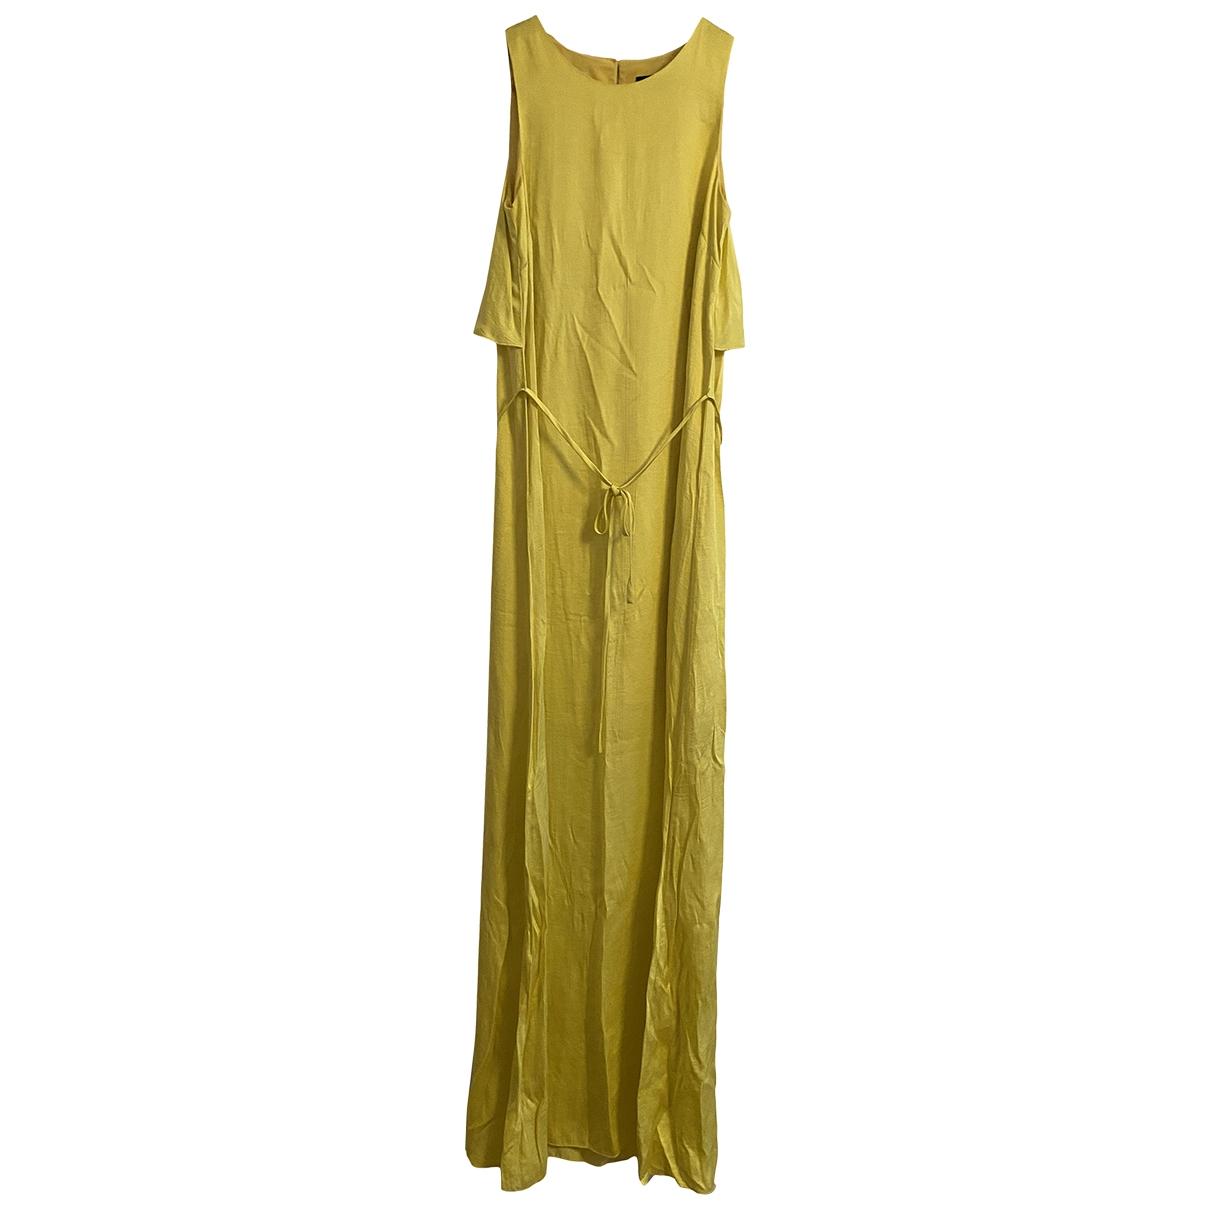 Emporio Armani \N Kleid in  Gelb Polyester